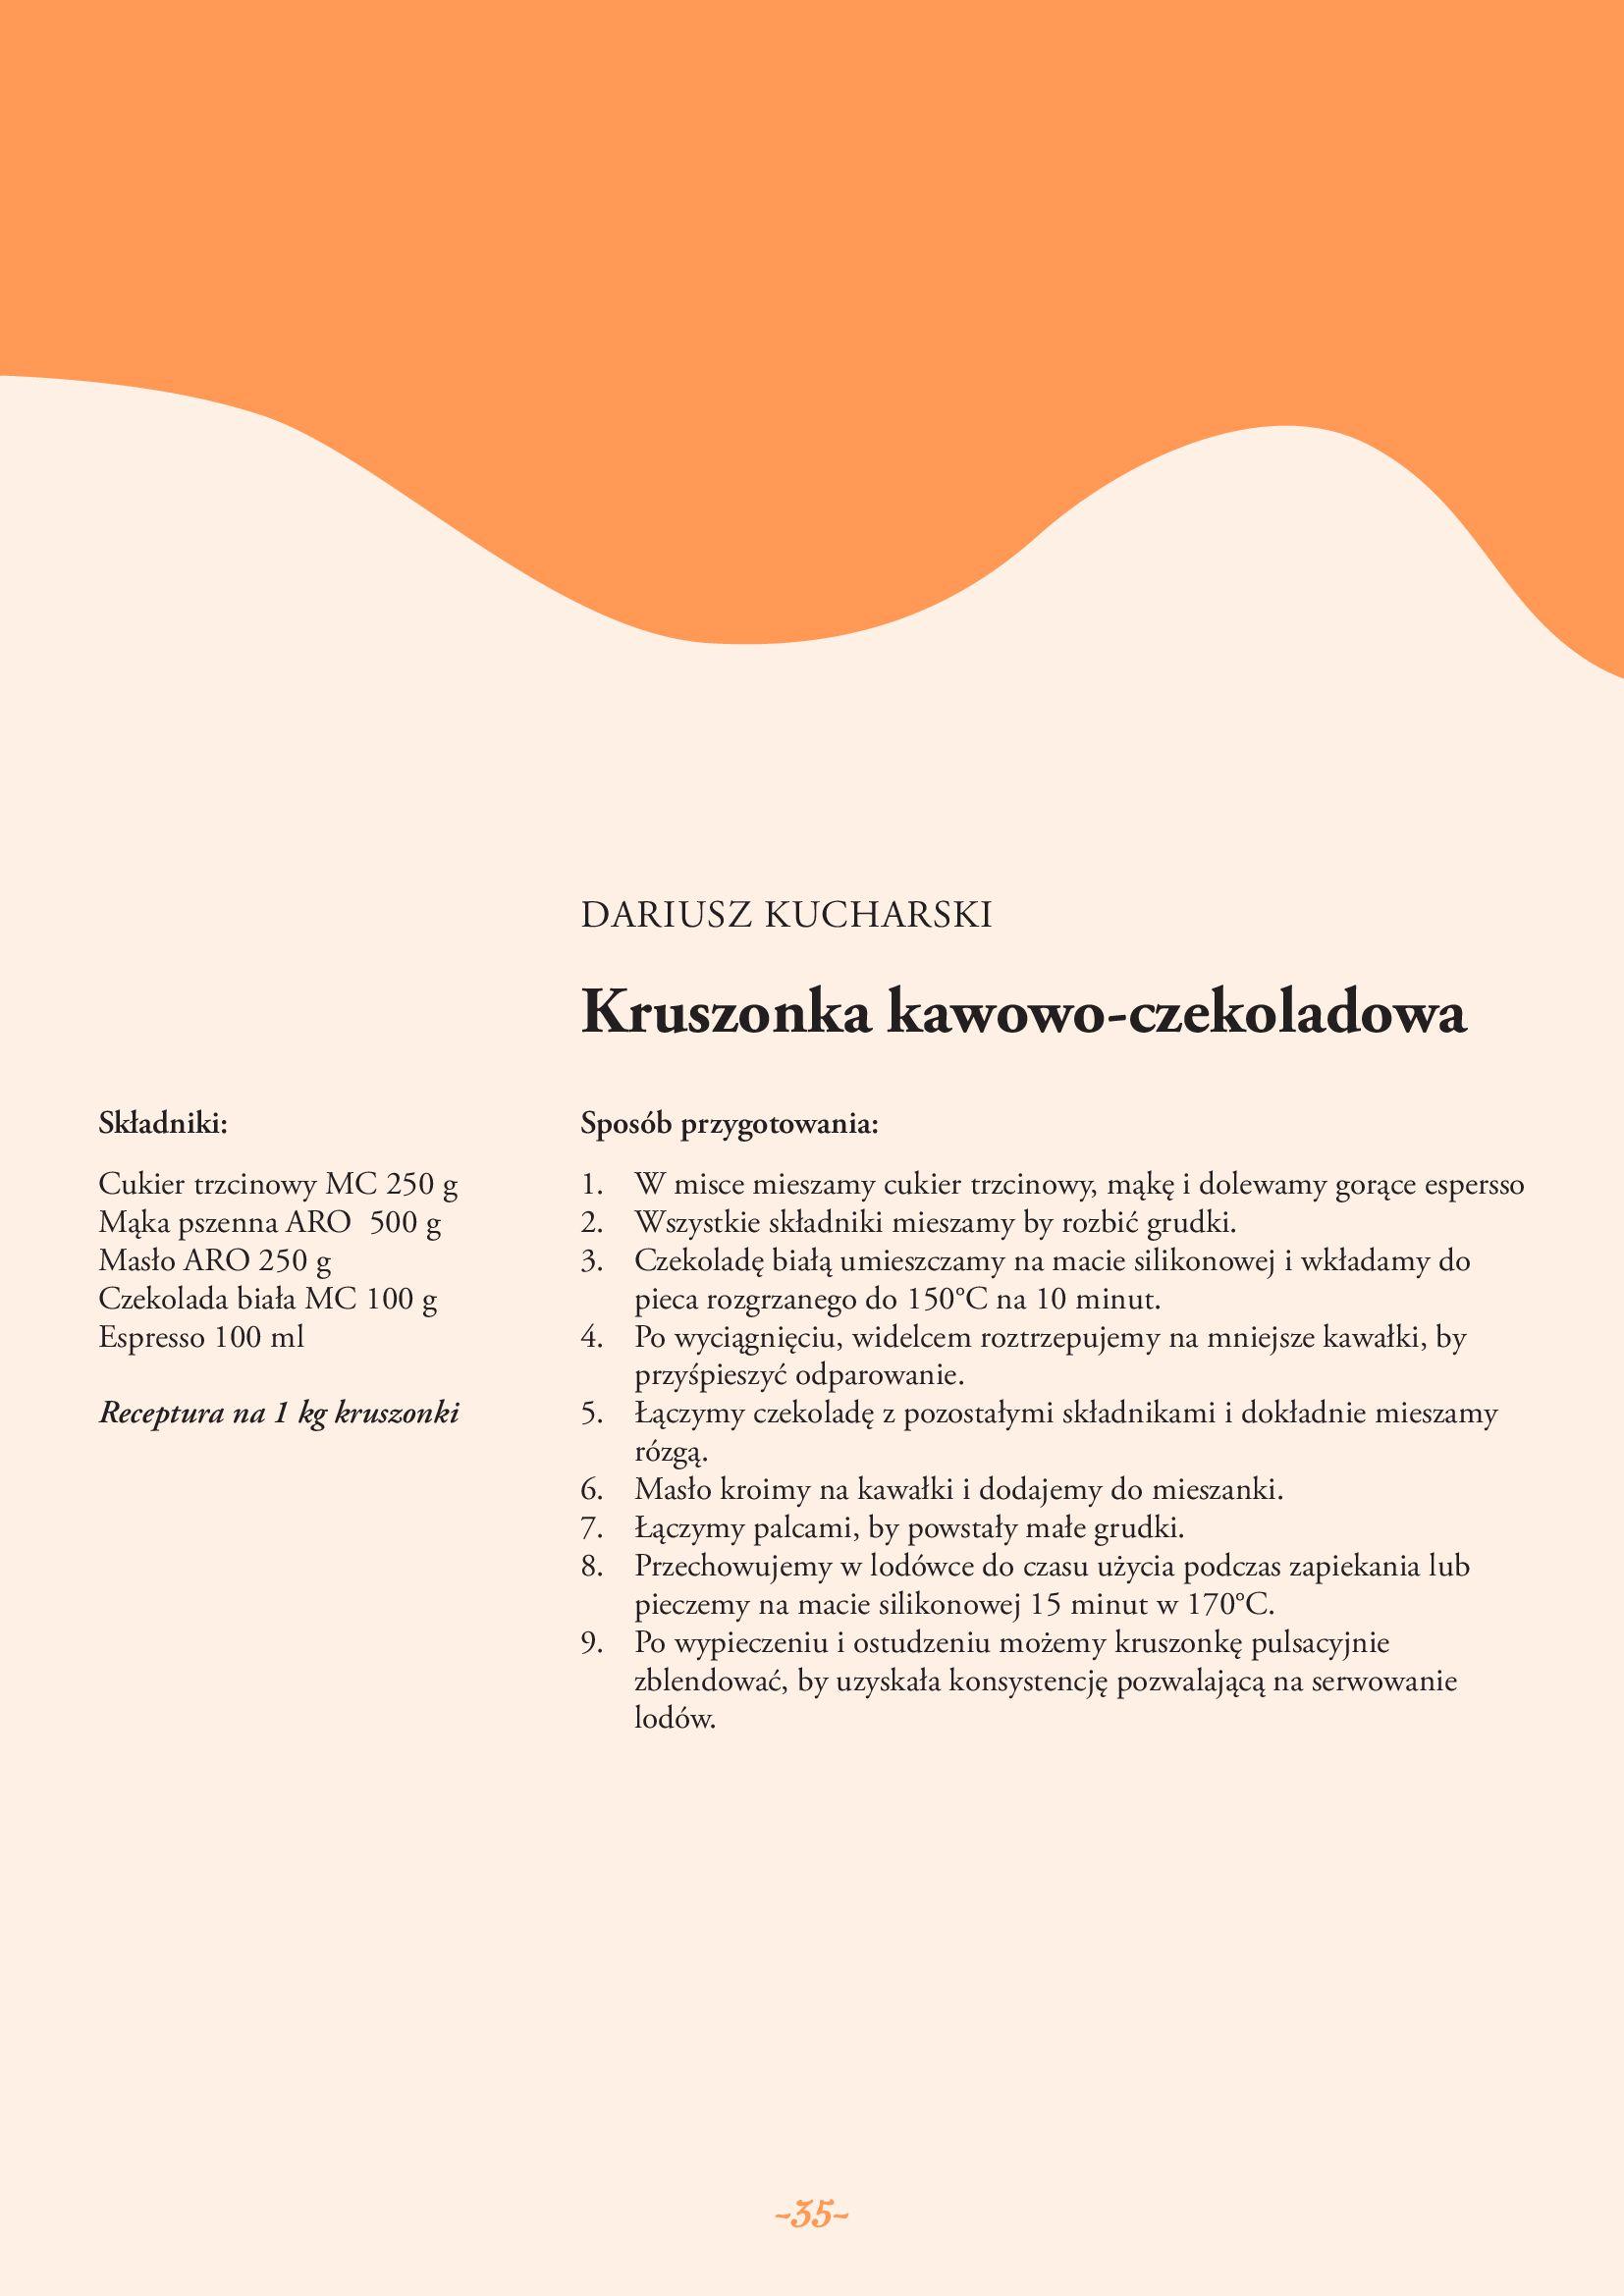 Gazetka Makro: Gazetka Makro - lody i desery 2021-05-21 page-35